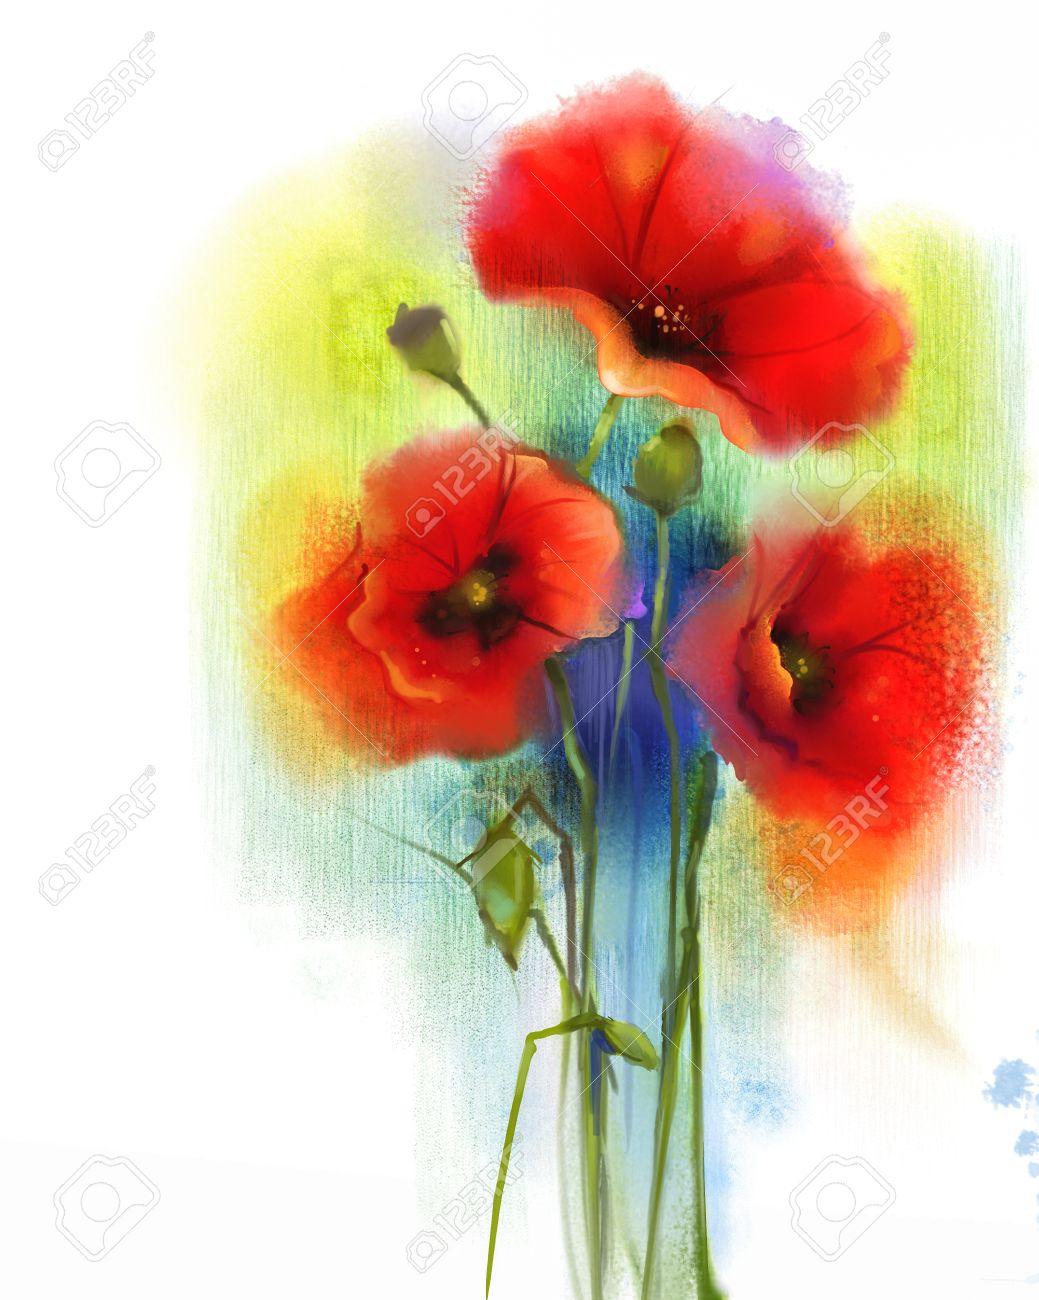 Aquarell Rote Mohnblumenmalerei. Hand Malen Mohn Blumen In Sanften ...